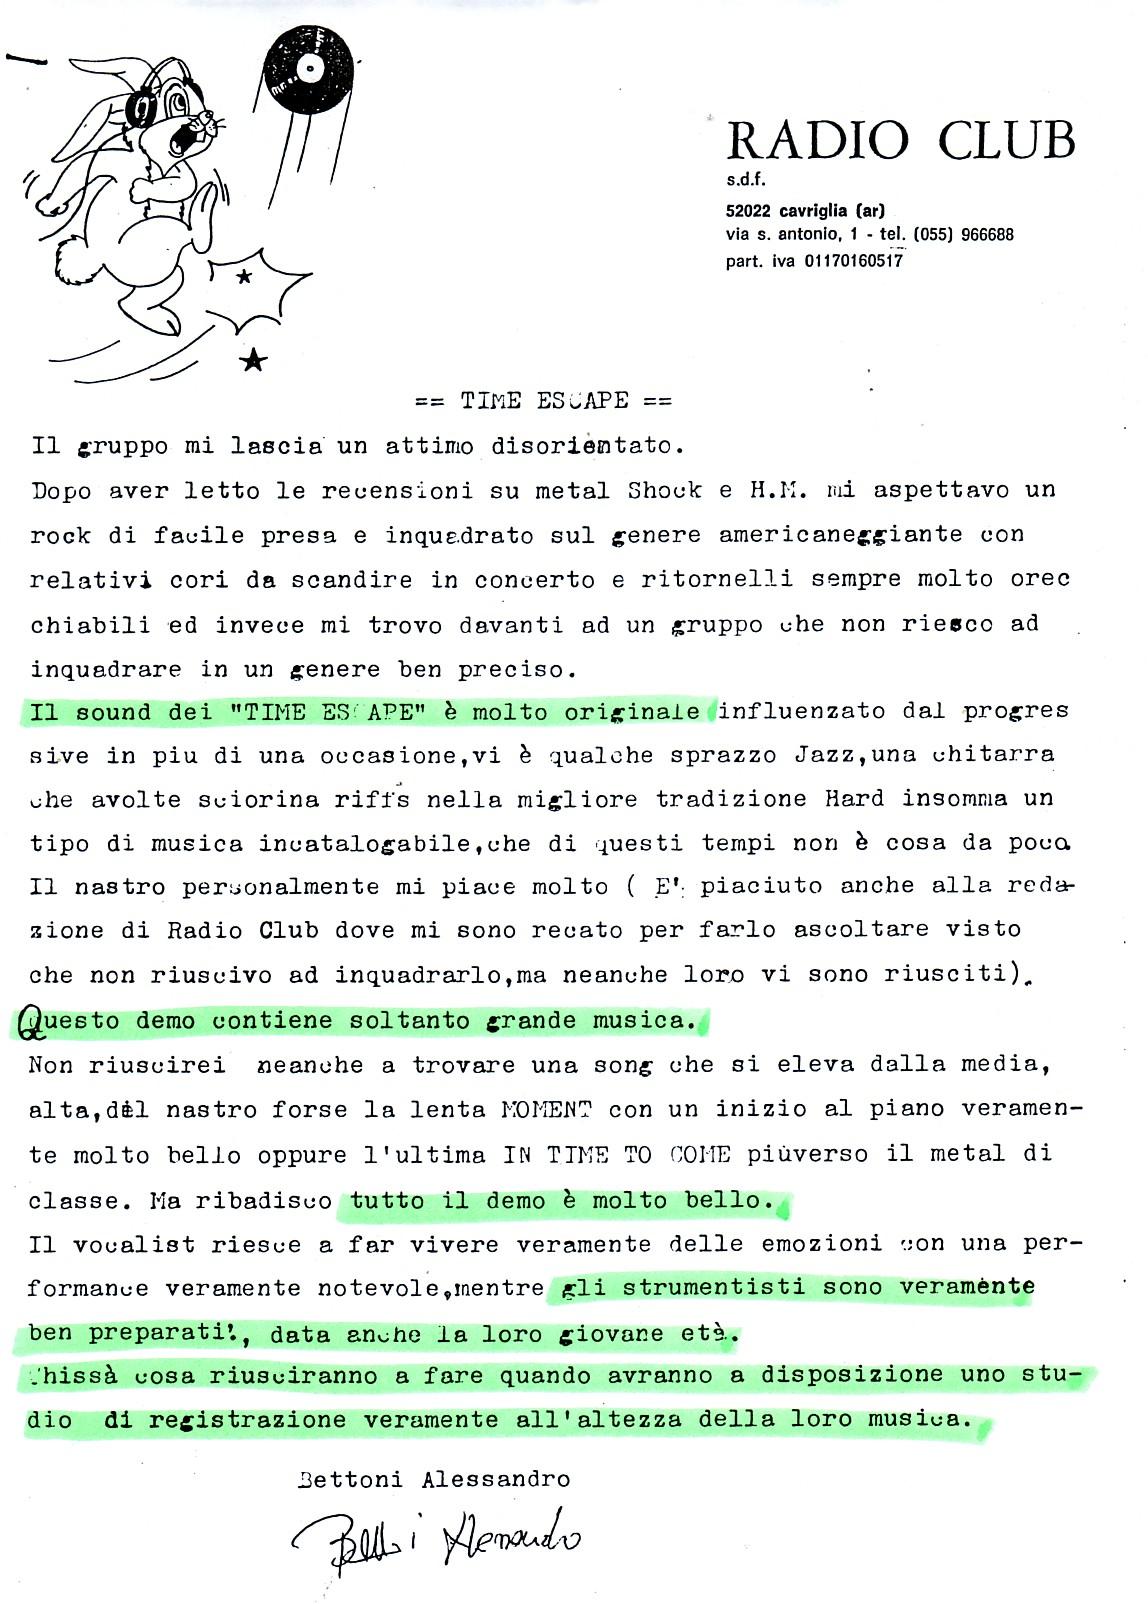 RADIO CLUB [1] (ITALY) - 1988